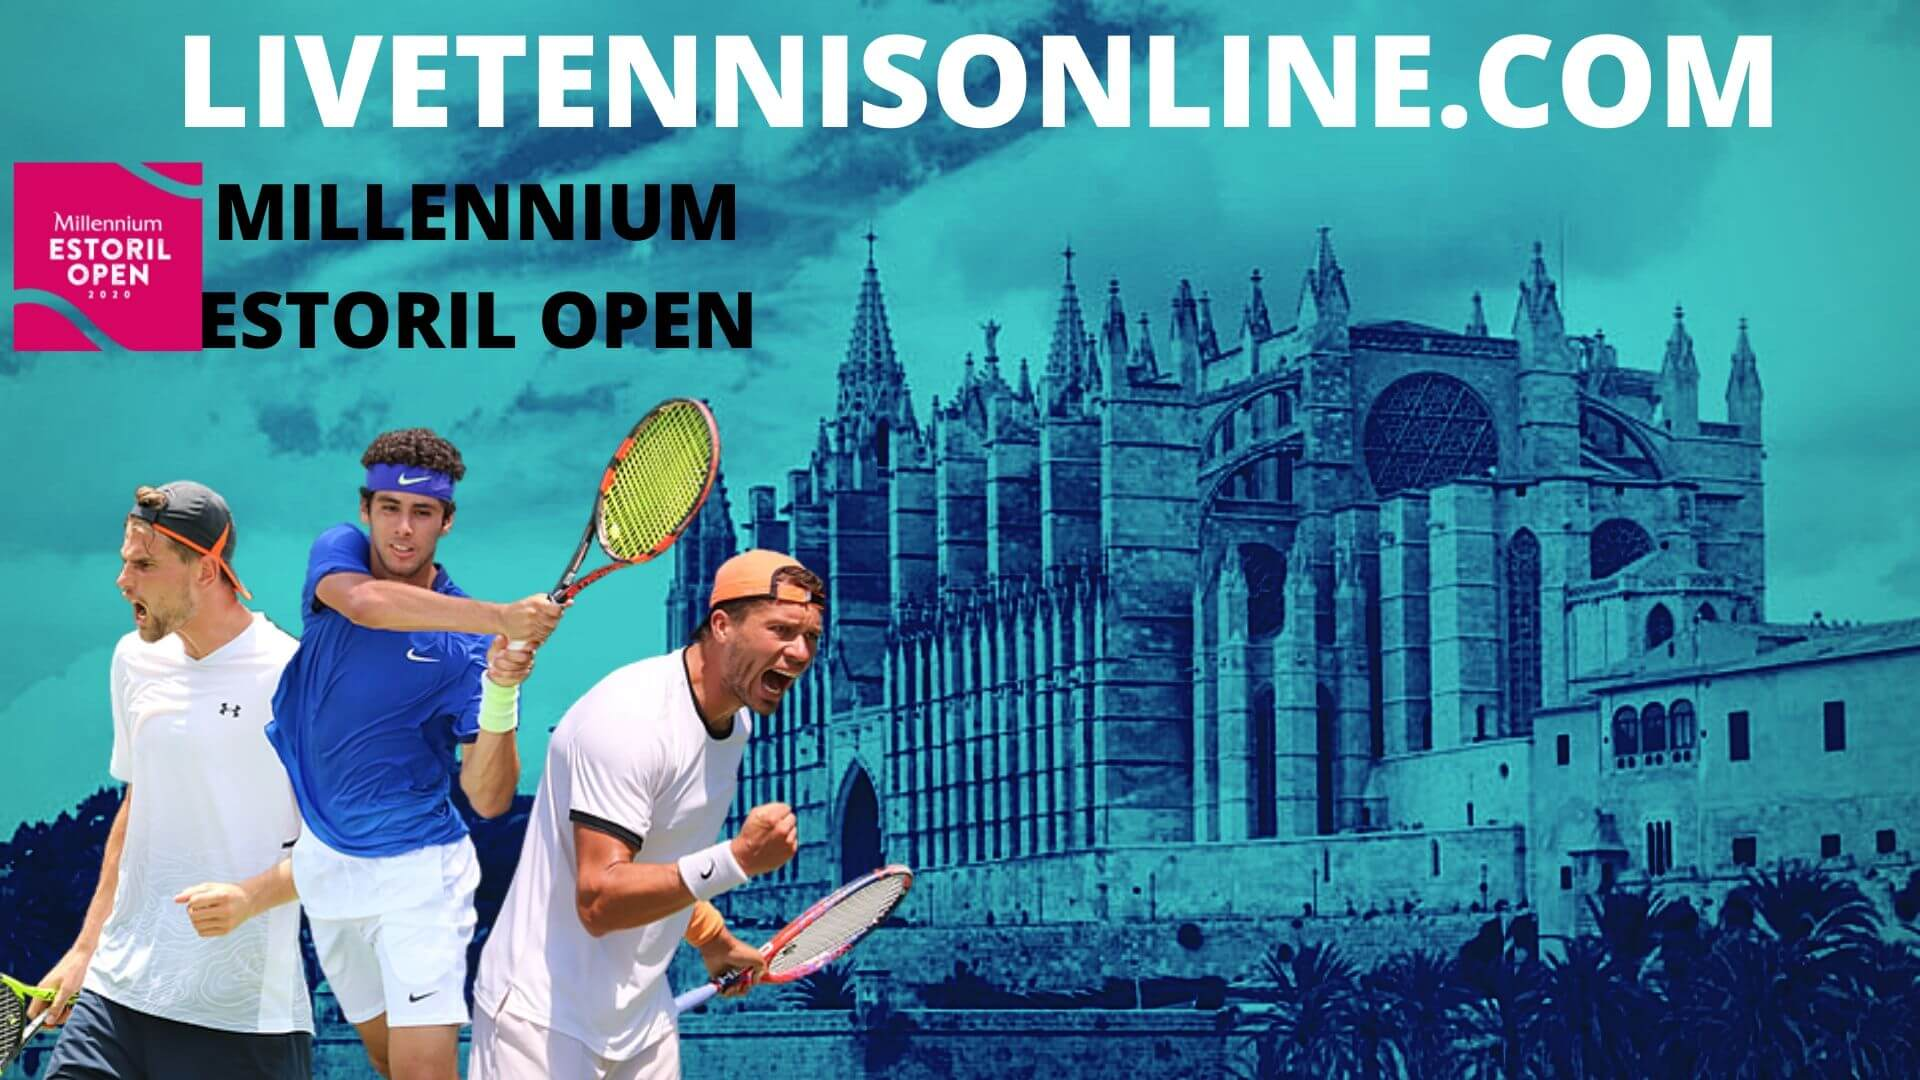 Millennium Estoril Open Live Stream 2020 |ATP  Semi Final